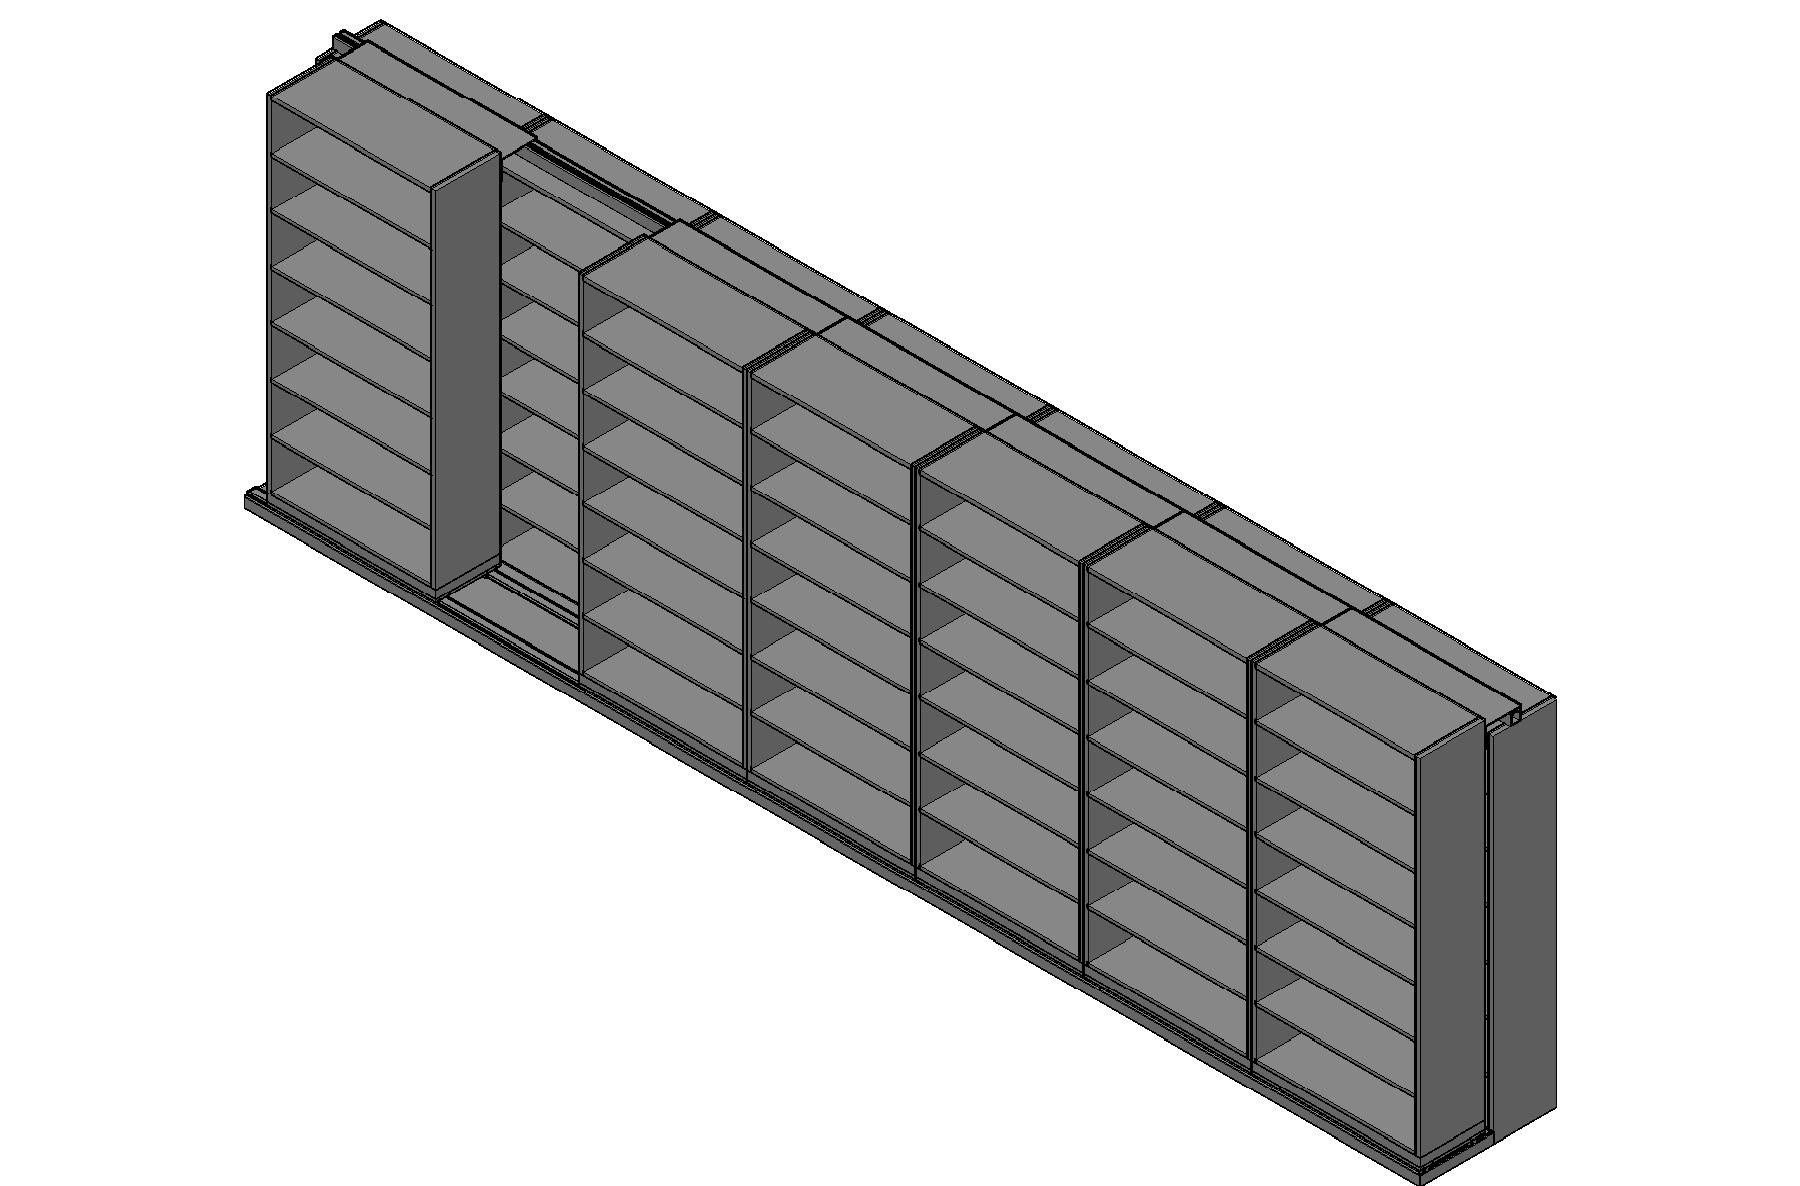 "Box Size Sliding Shelves - 2 Rows Deep - 7 Levels - (42"" x 16"" Shelves) - 298"" Total Width"